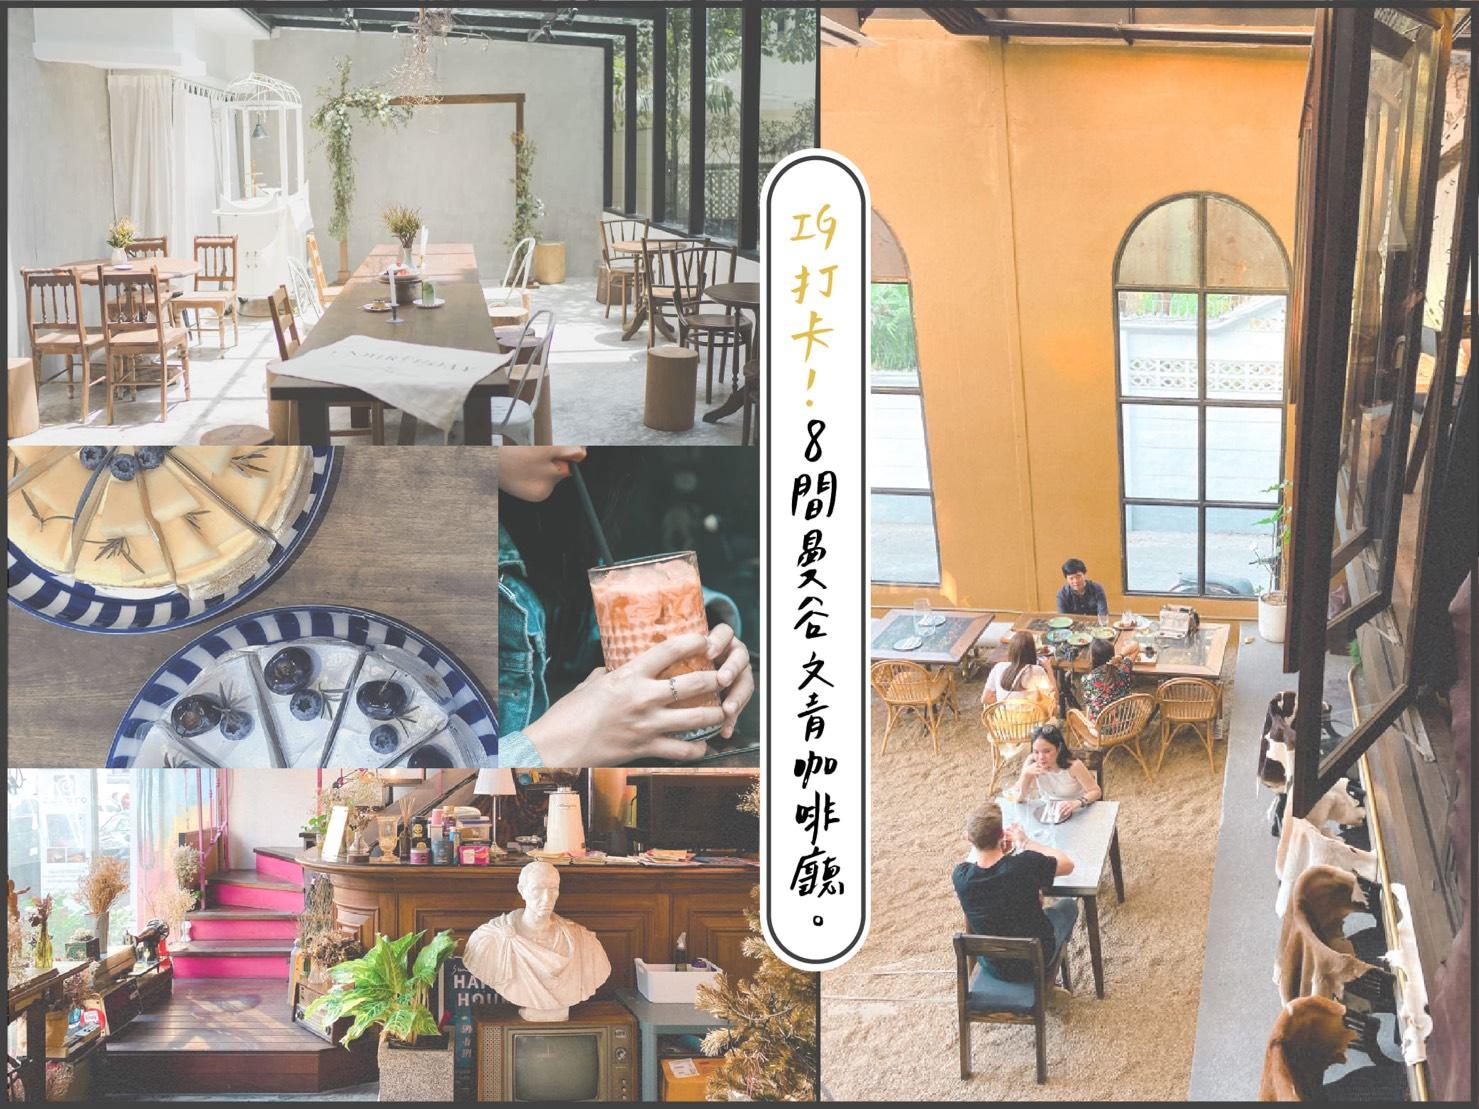 曼谷咖啡 bangkok cafe